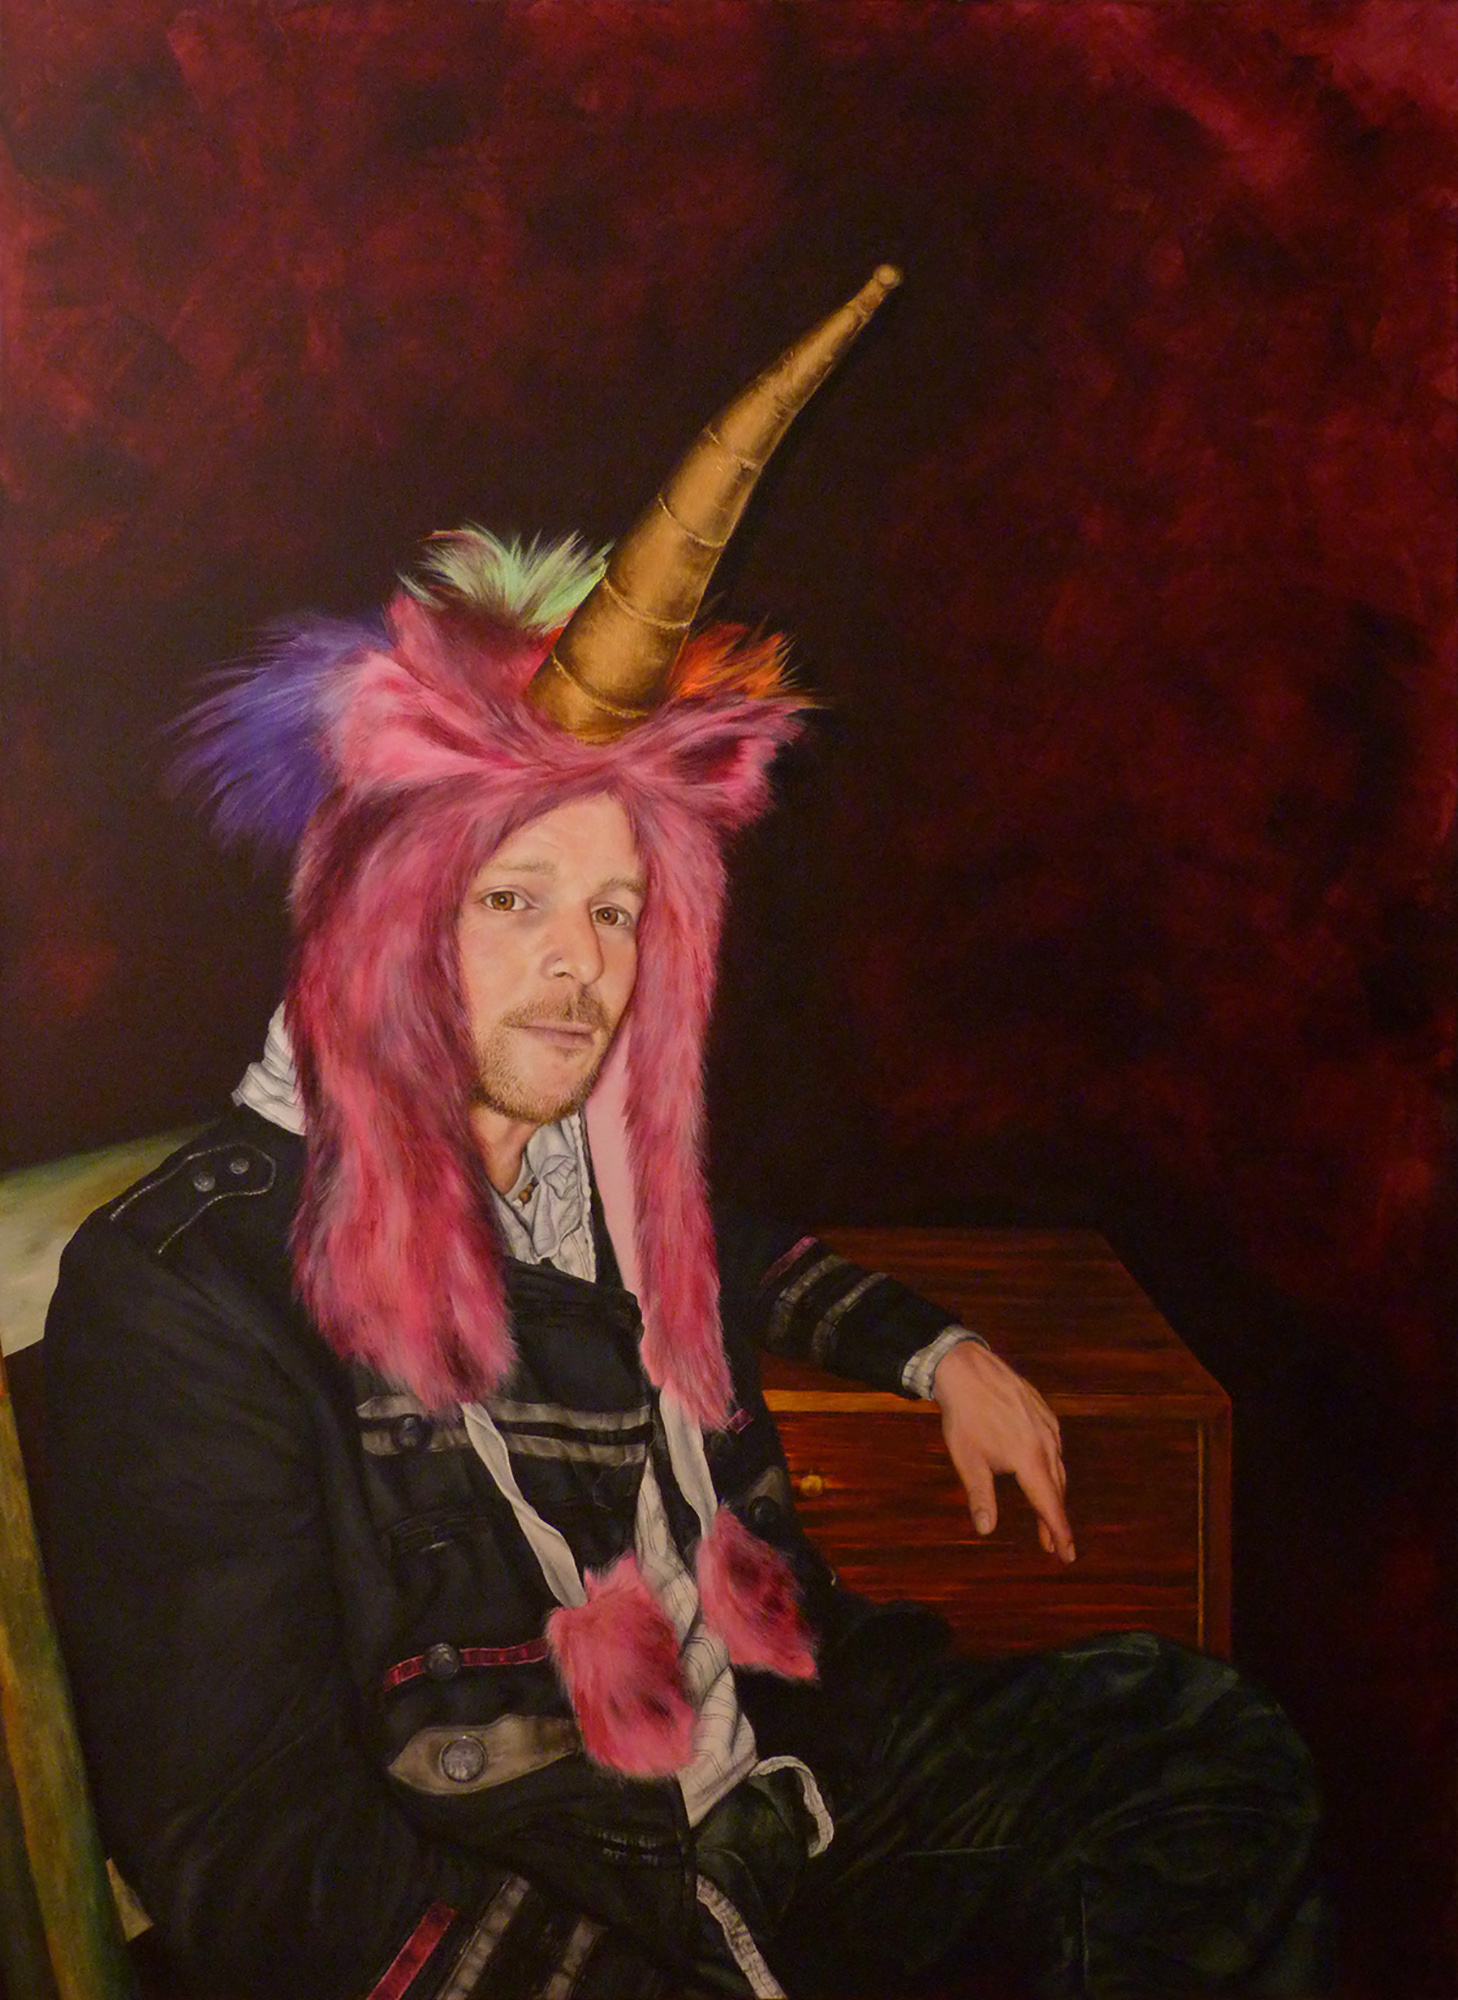 Deborah Ireland, Uncle Steve, Acrylic on canvas, 154 cm x 112 cm x 3.5 cm,  http://deborahireland.com